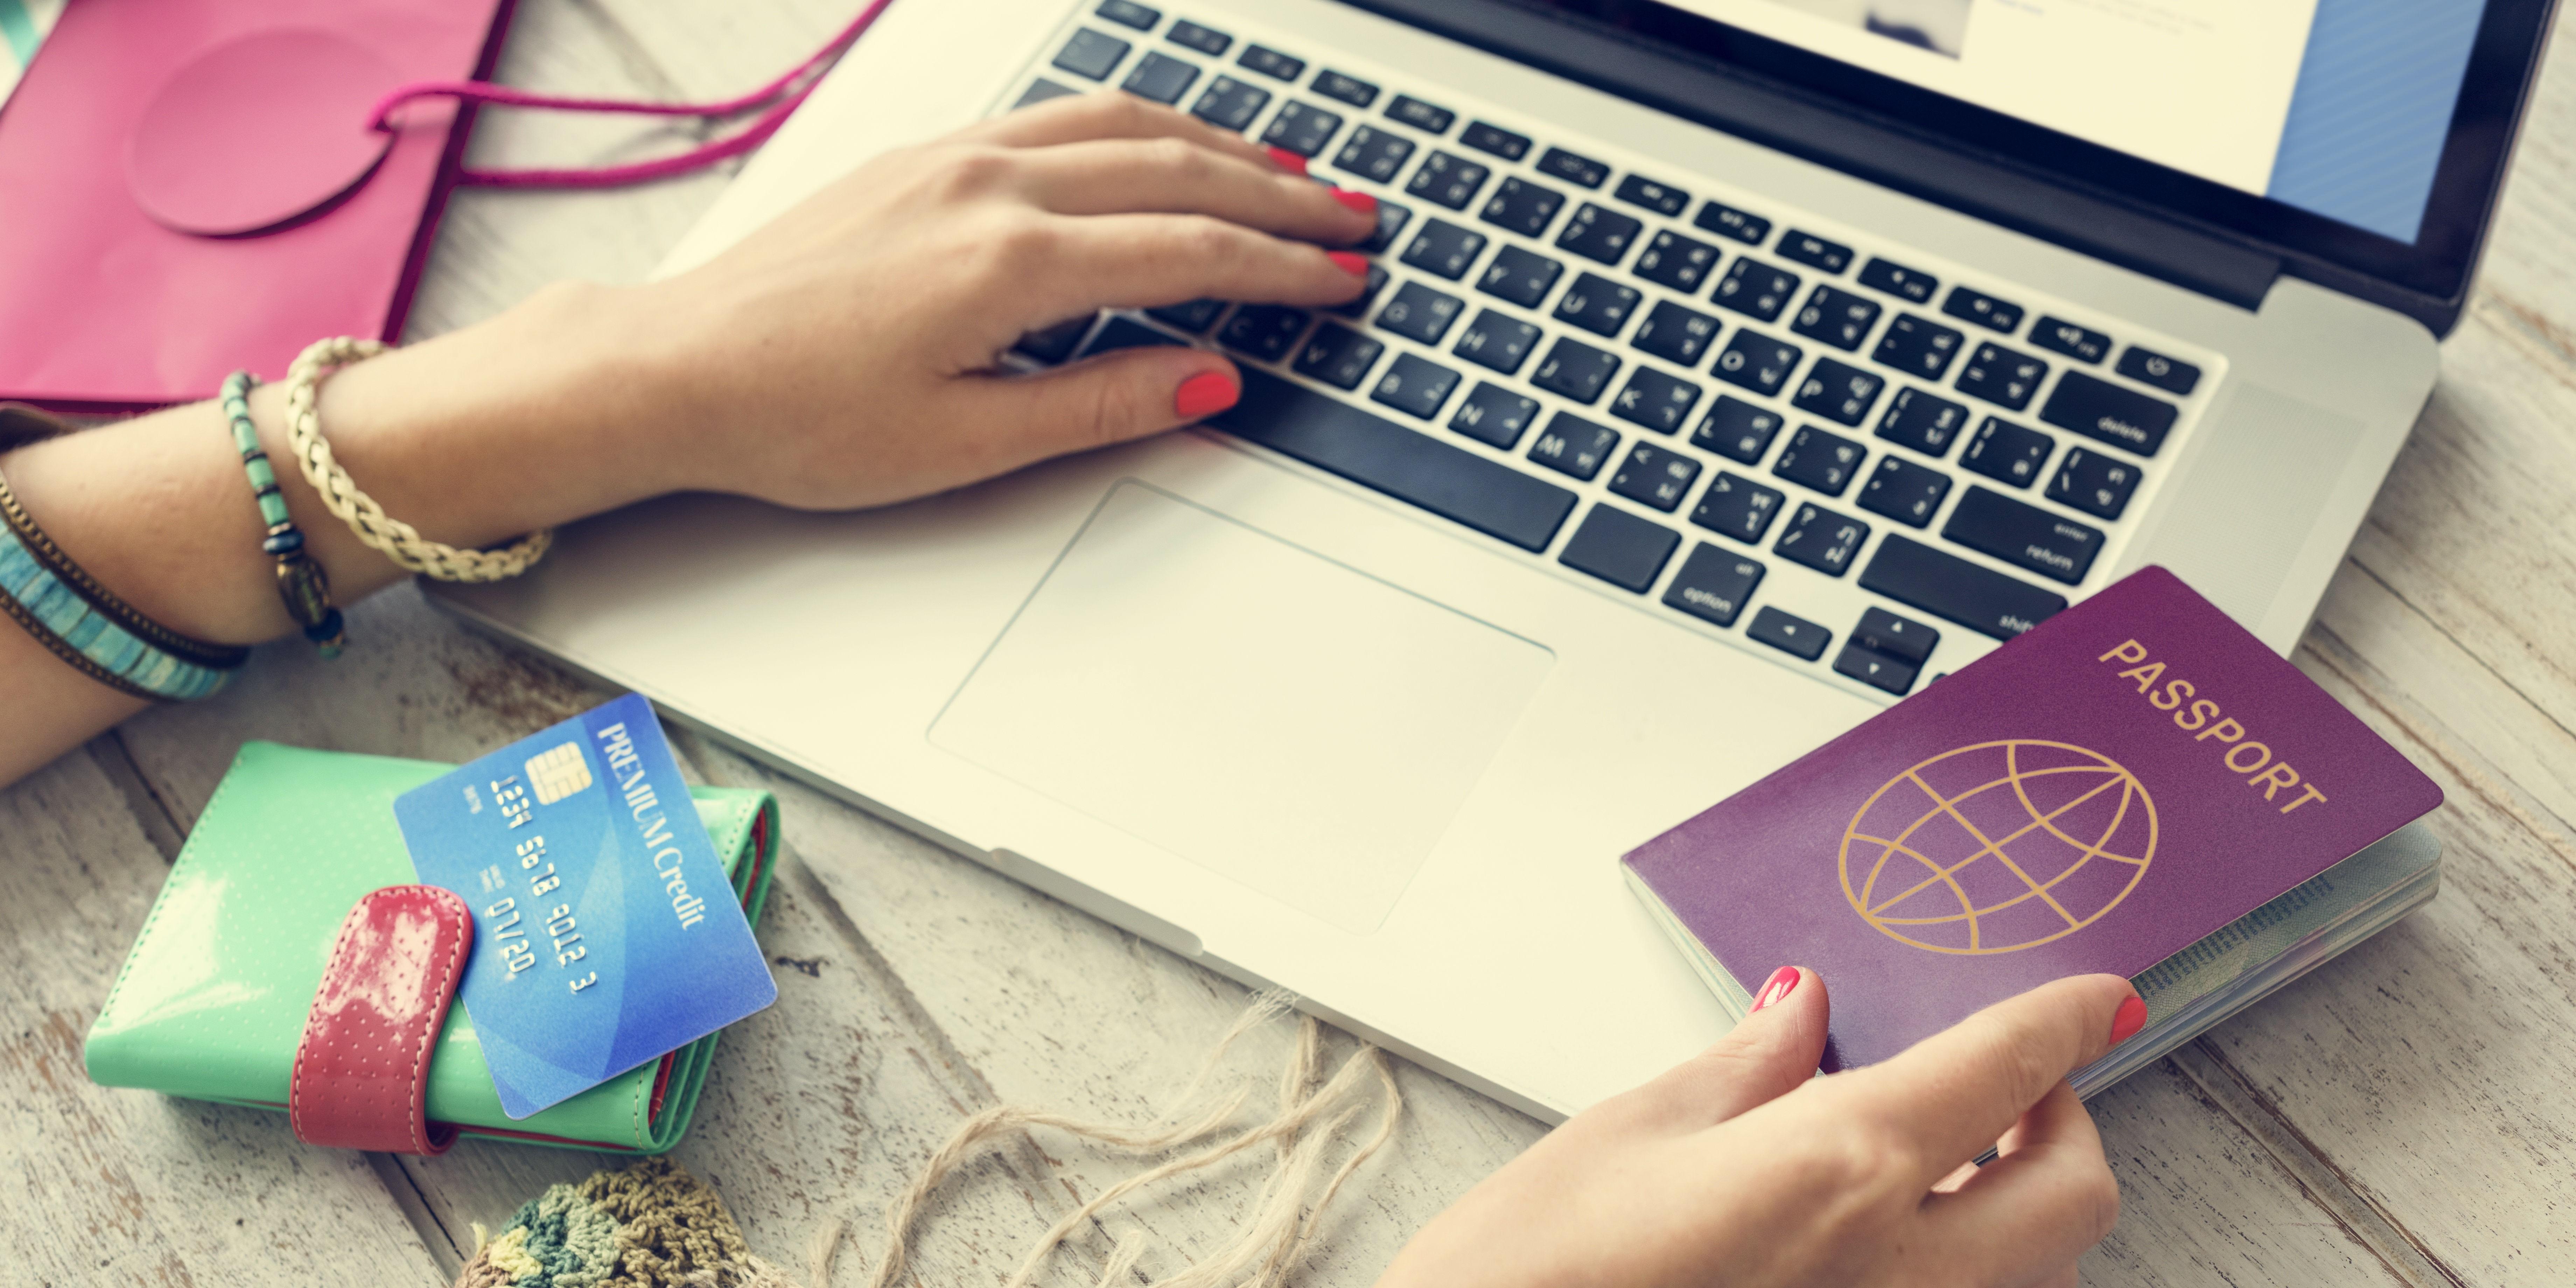 Person applying visa online